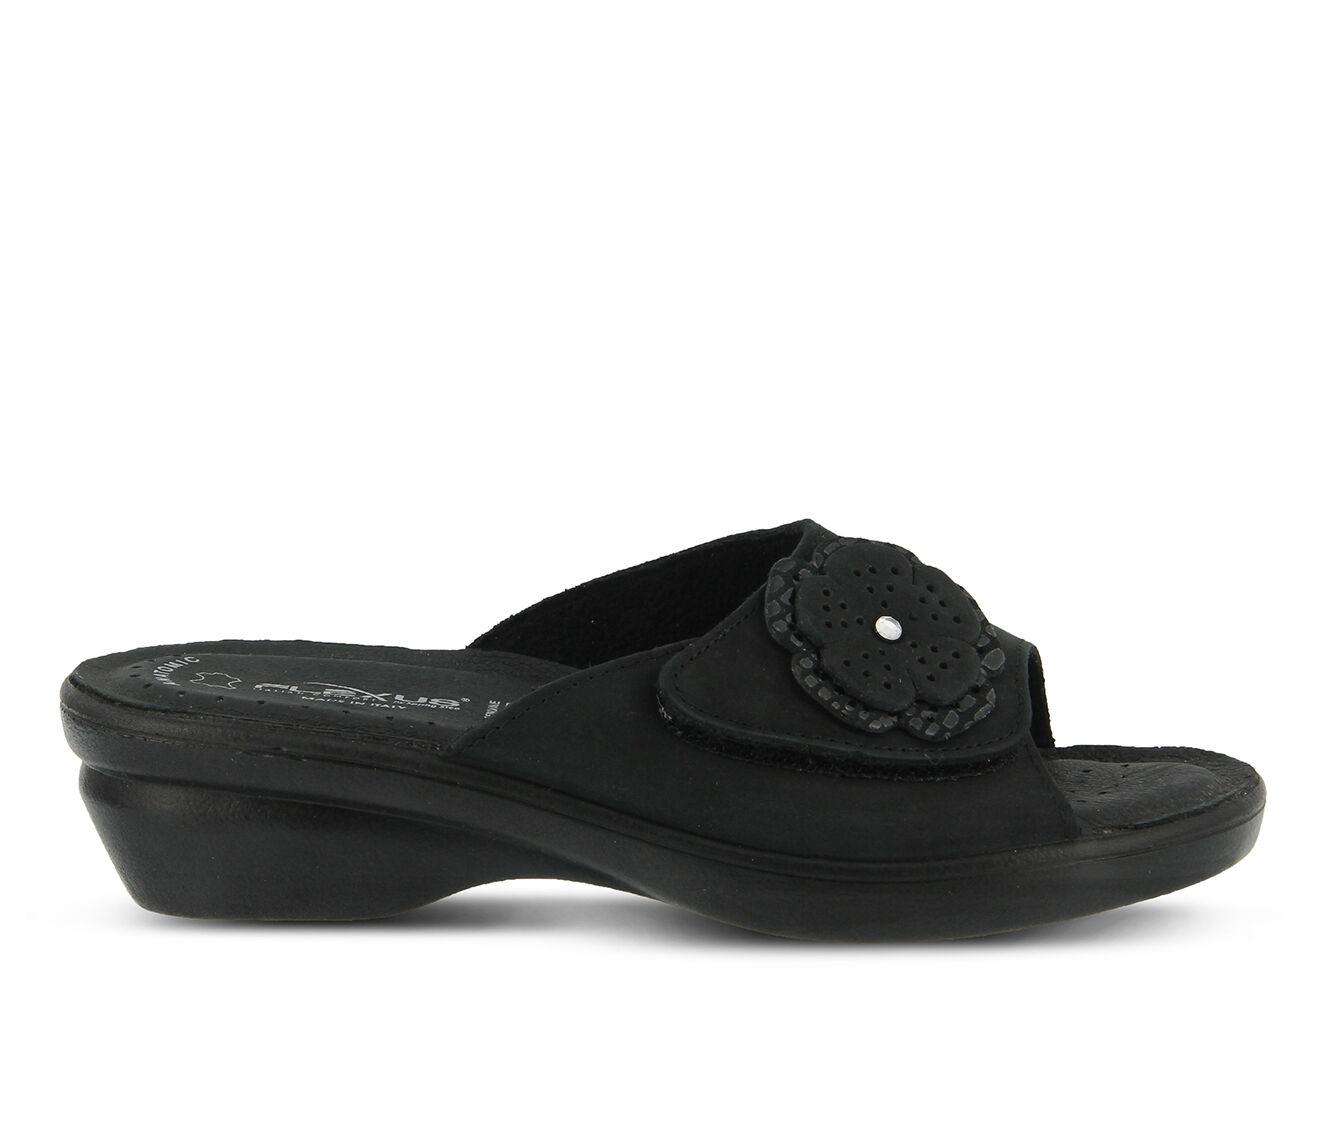 Women's FLEXUS Fabia Sandals Black